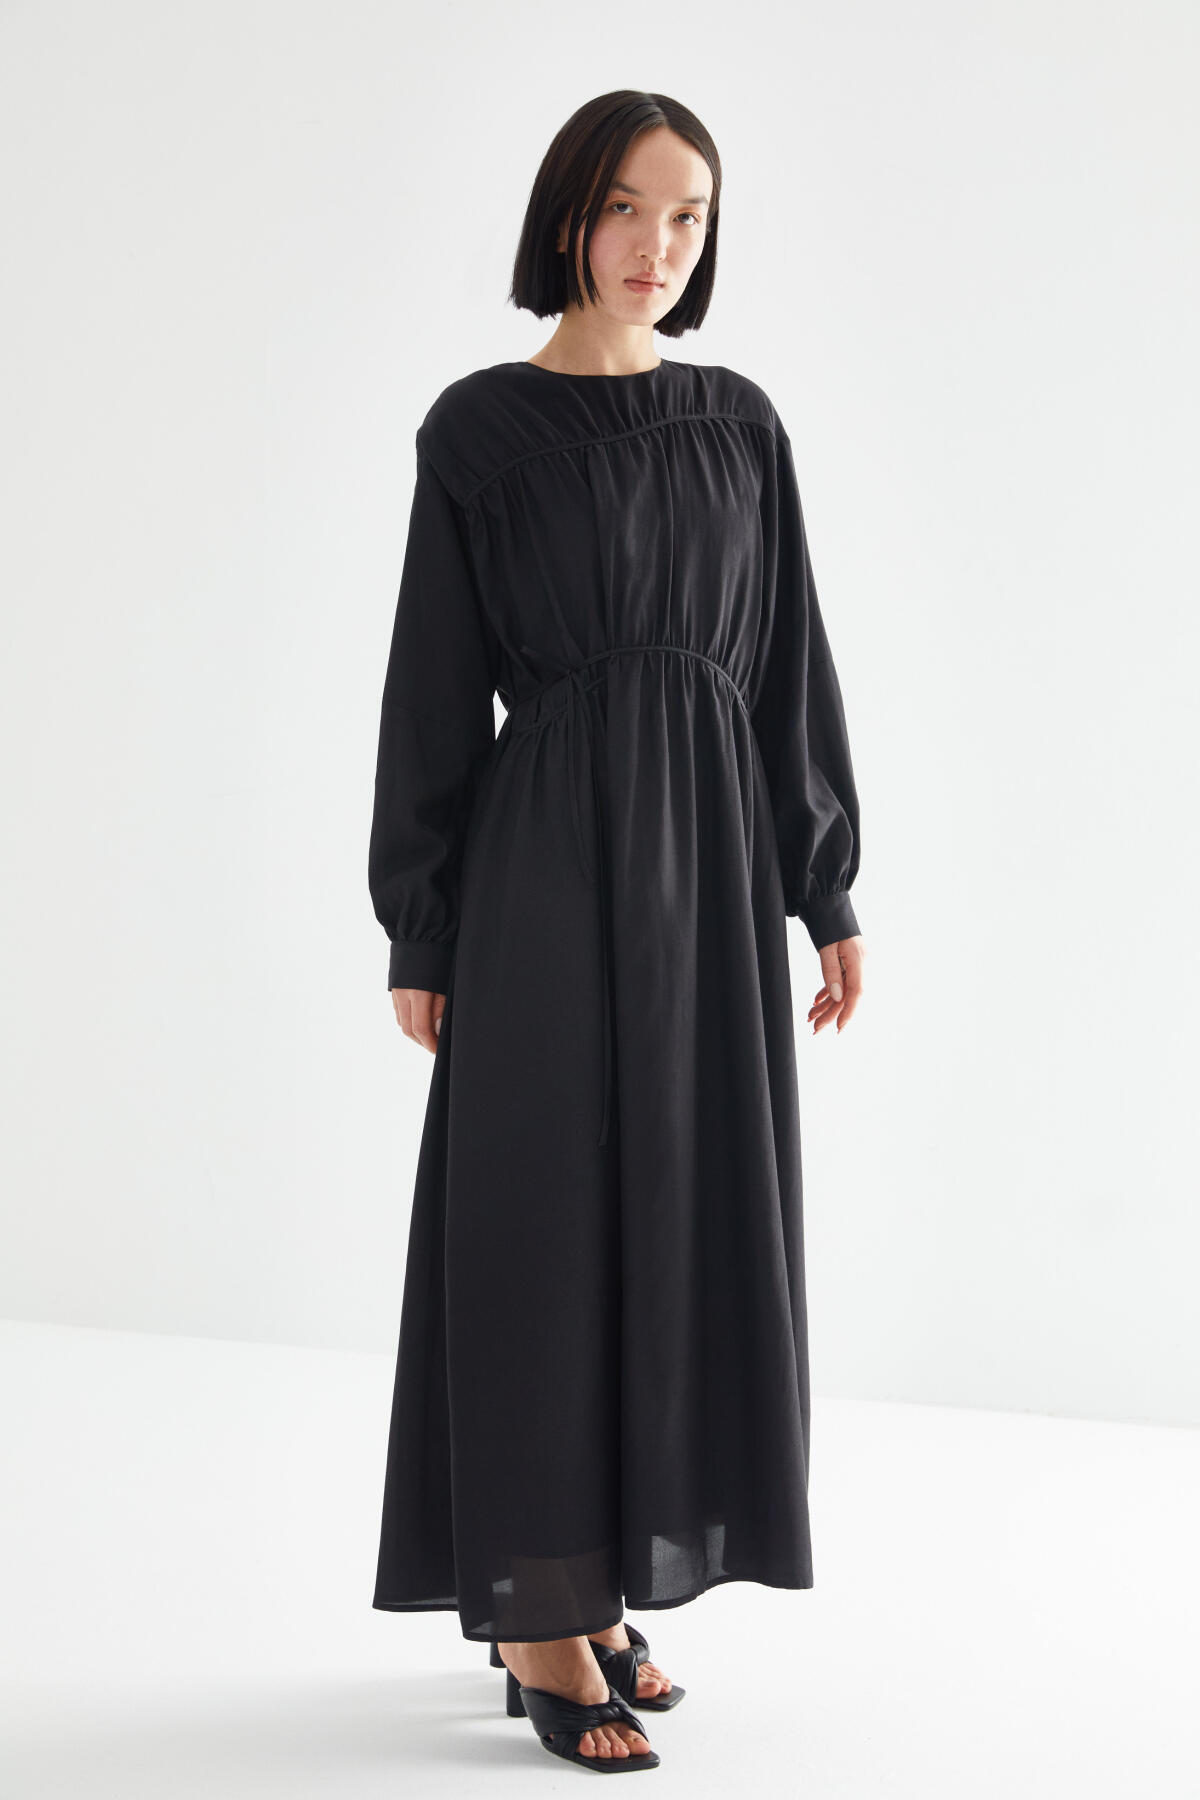 TIE LINED DRESS